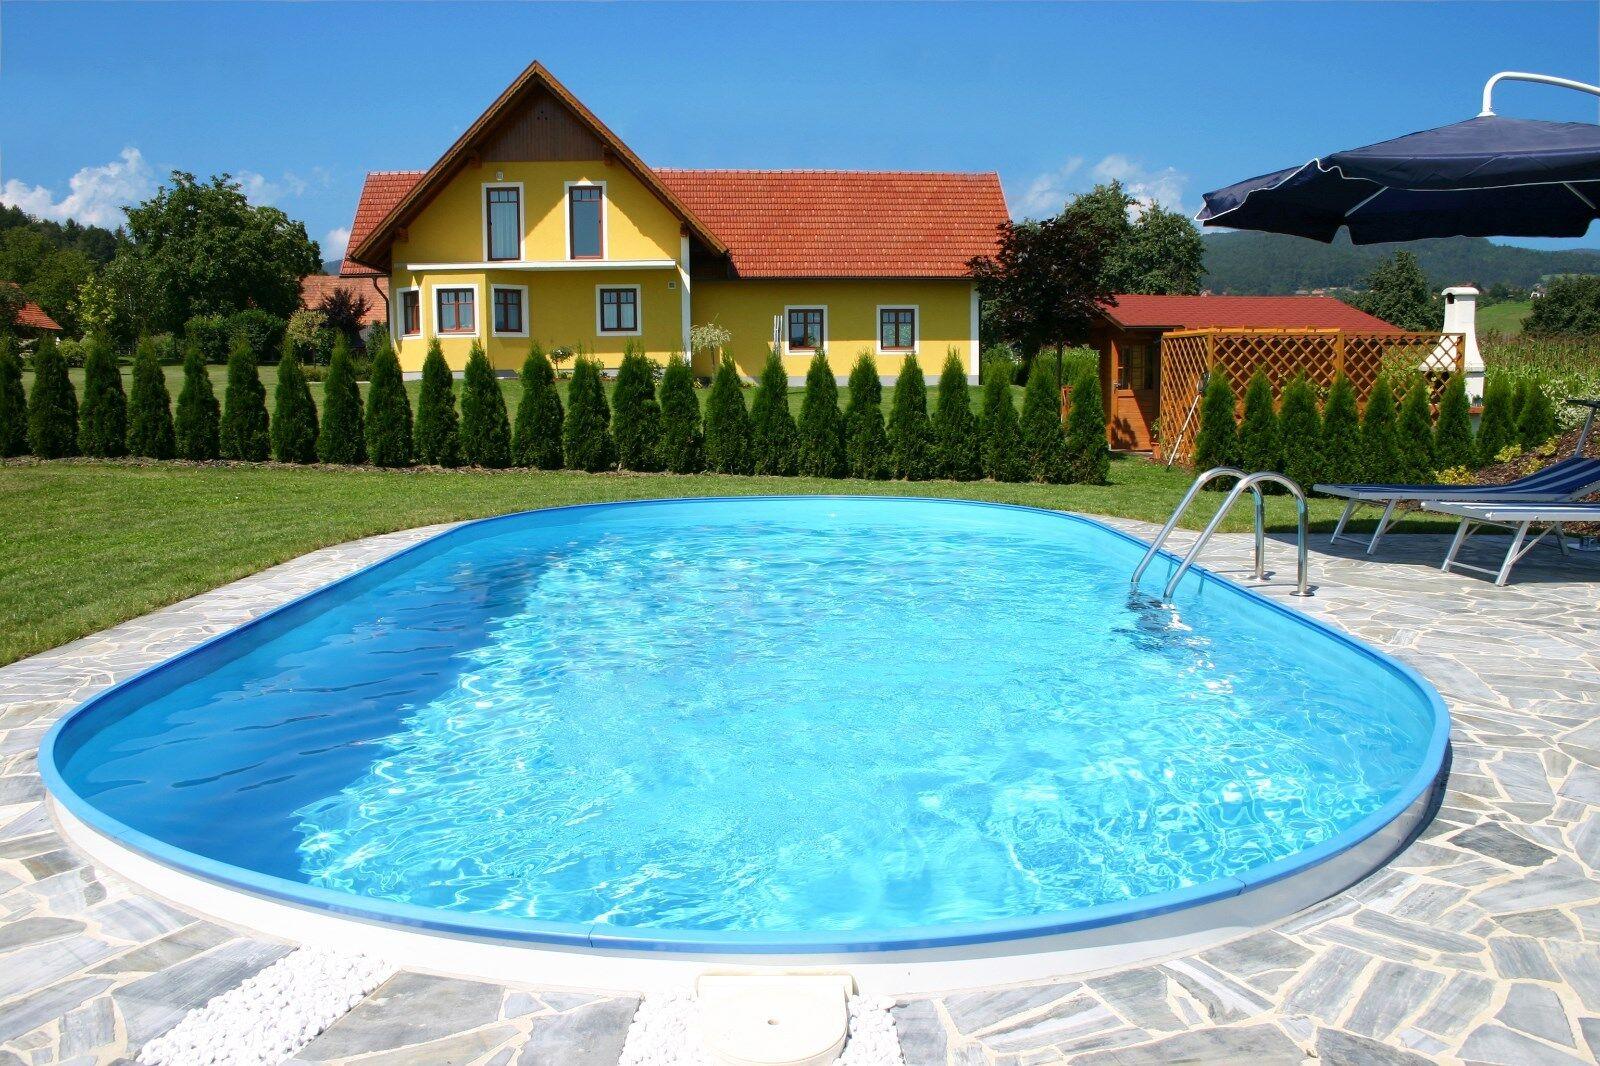 Pool Schwimmbad Ovalpool Lugano  4,20 x 8,00 x 1,50m